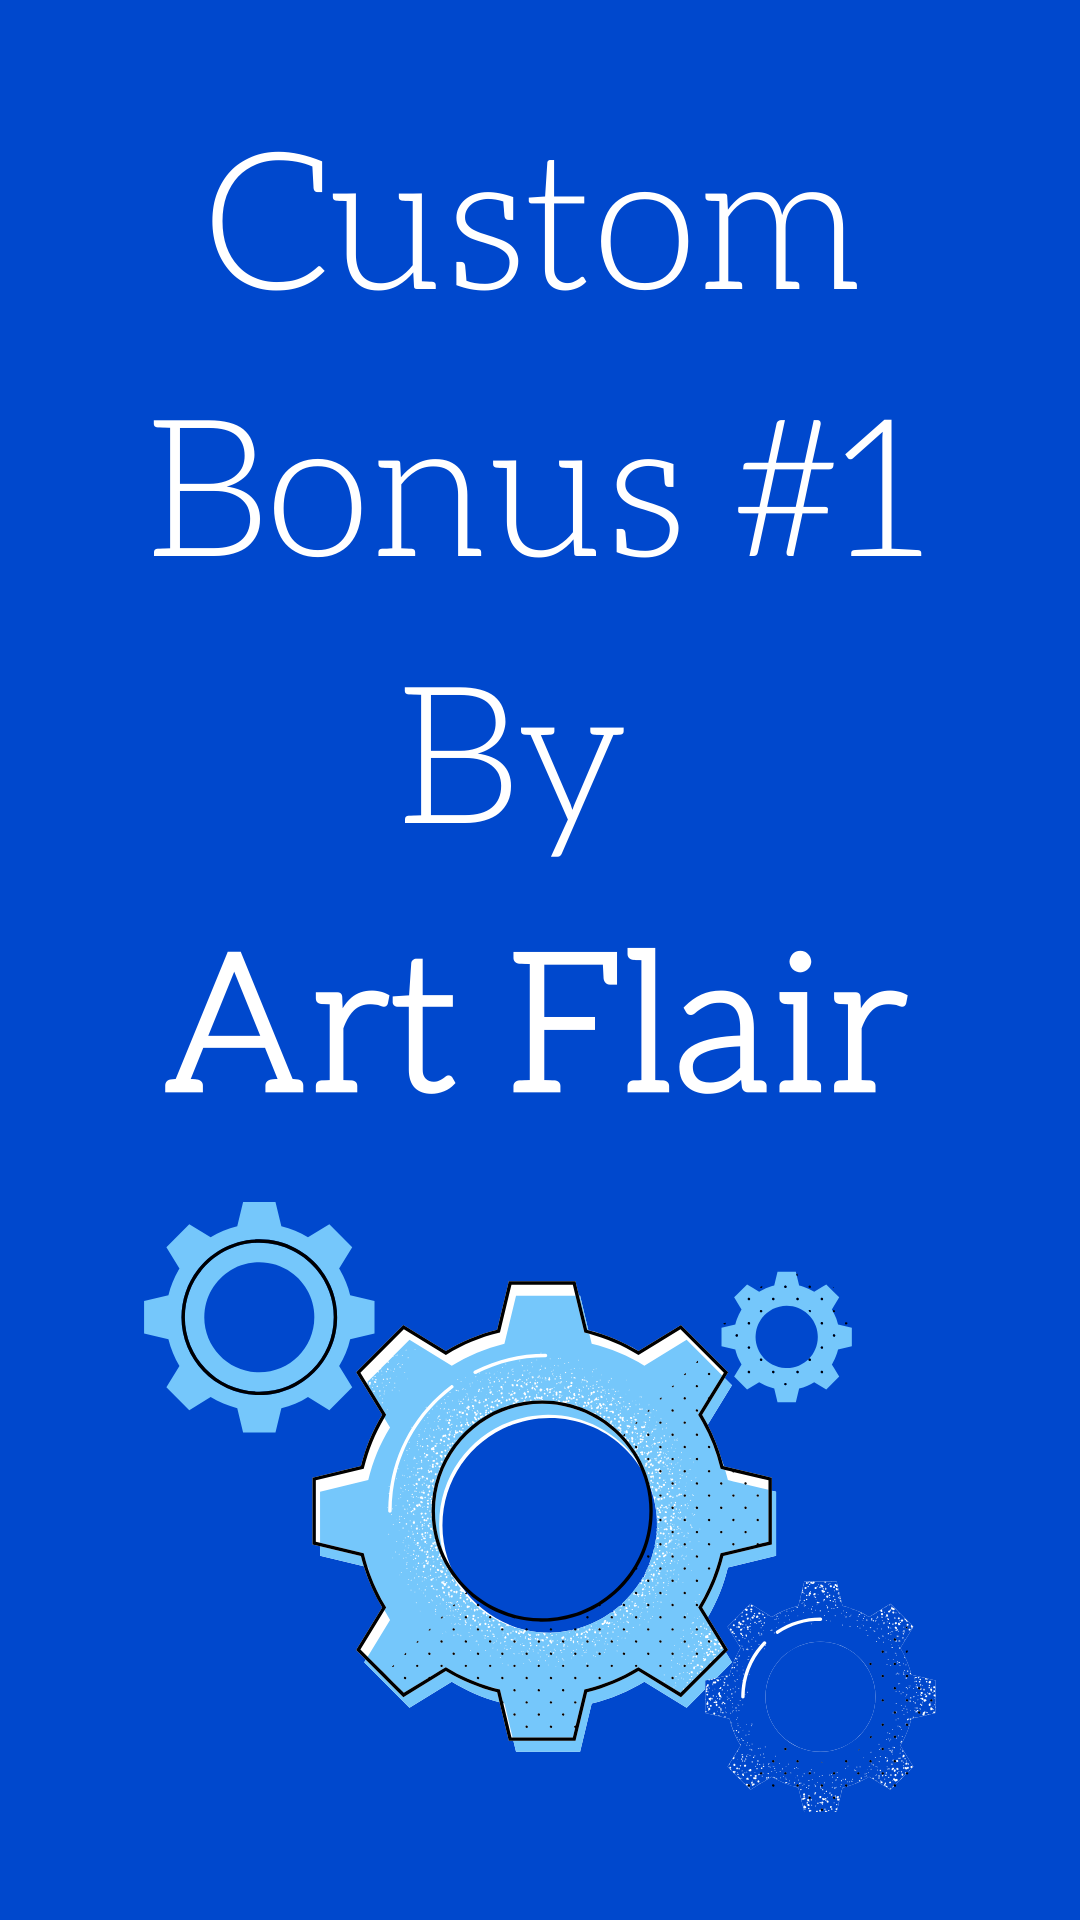 Custom Bonus for LeadSell by Art Flair